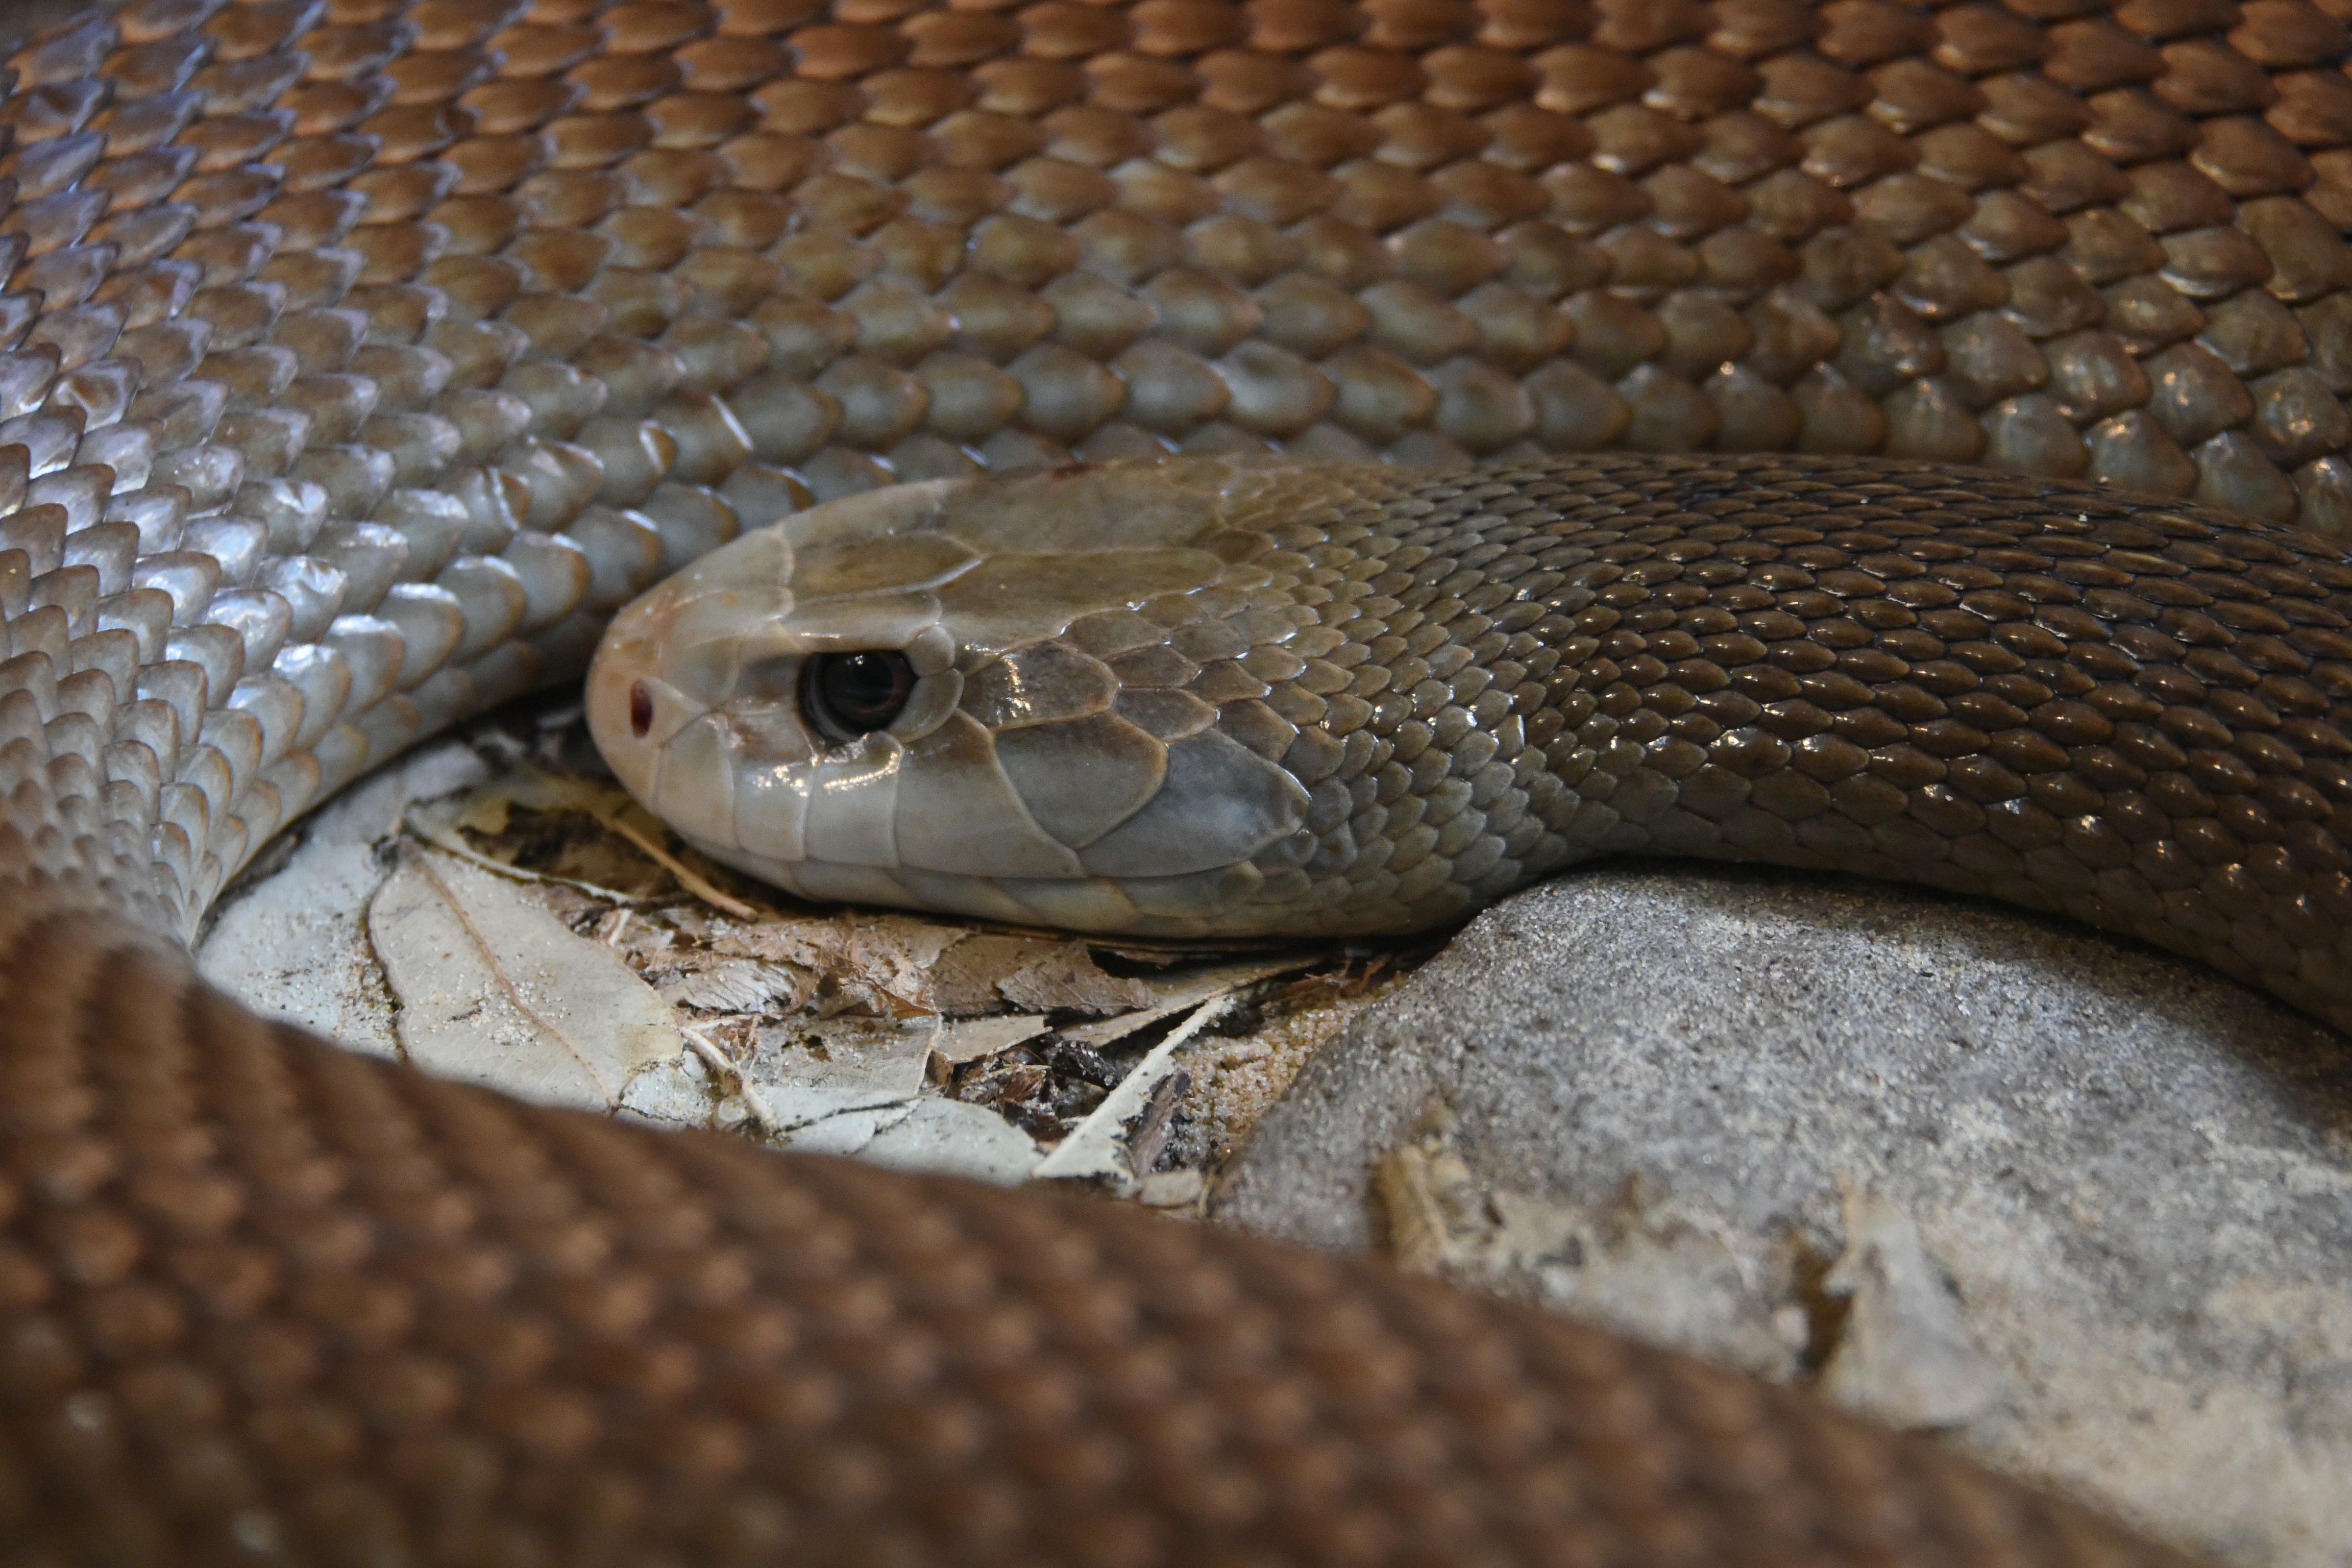 кедра тайпан змея фото сценические